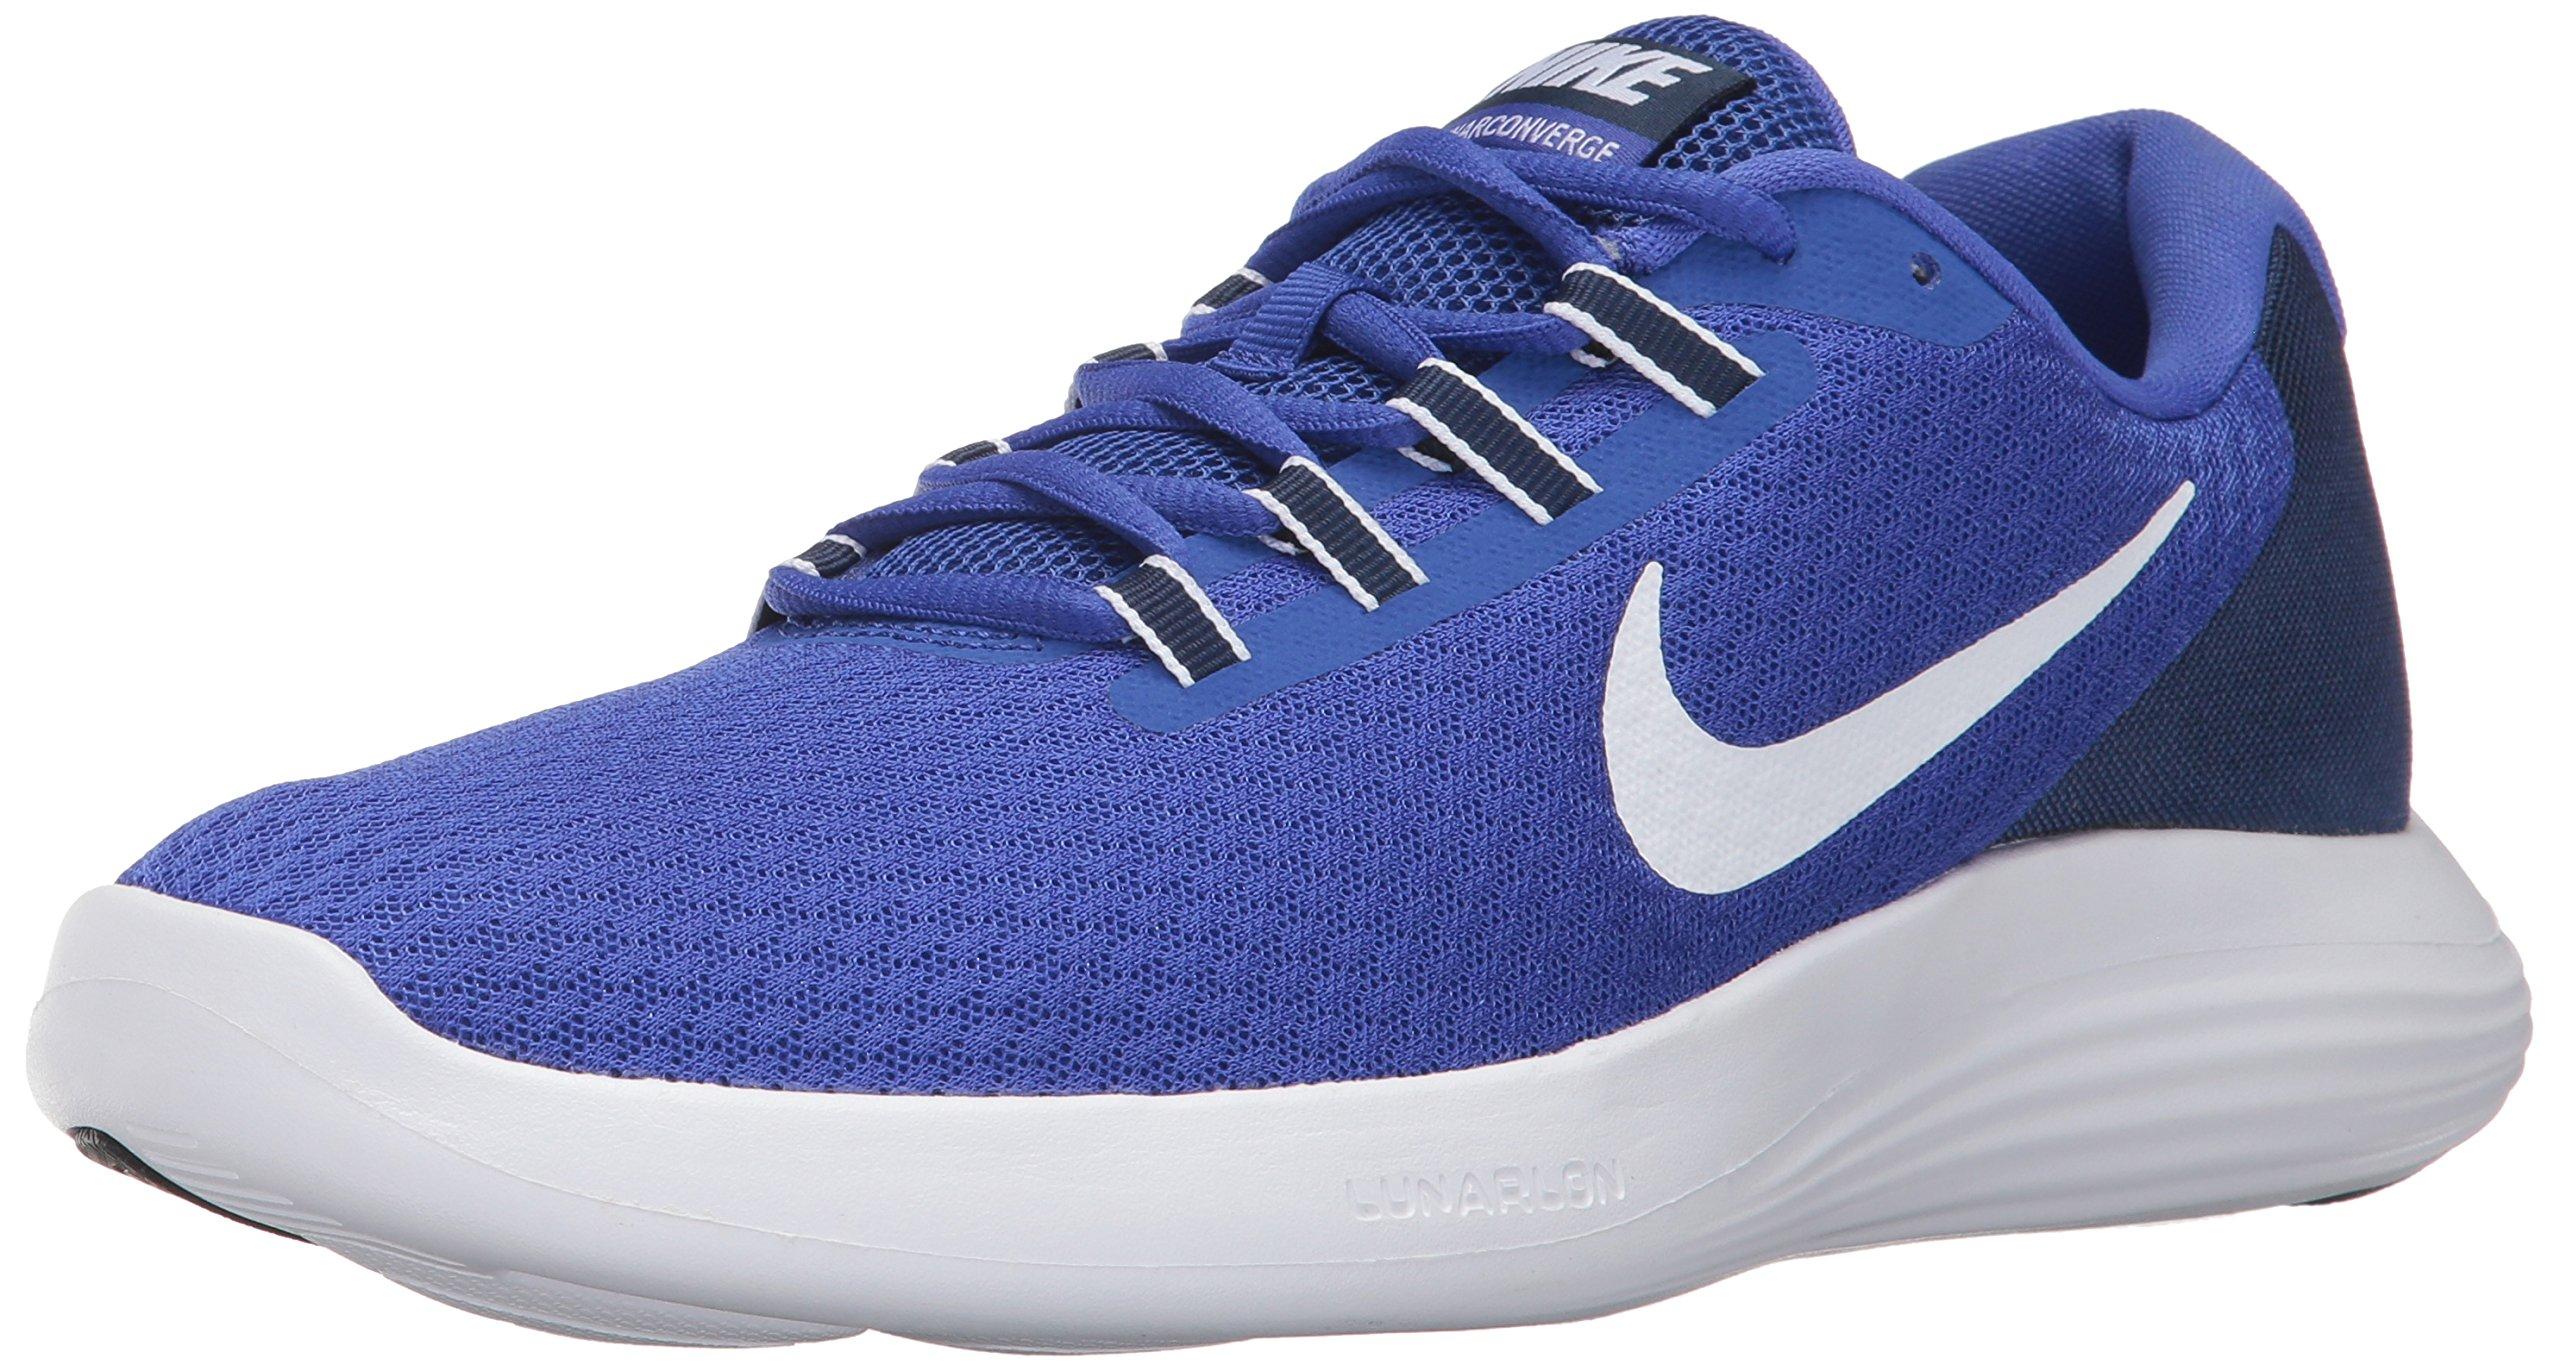 NIKE Men's Lunarconverge Running Shoe, Paramount Blue/White/Binary Blue/Black, 10.5 D(M) US by NIKE